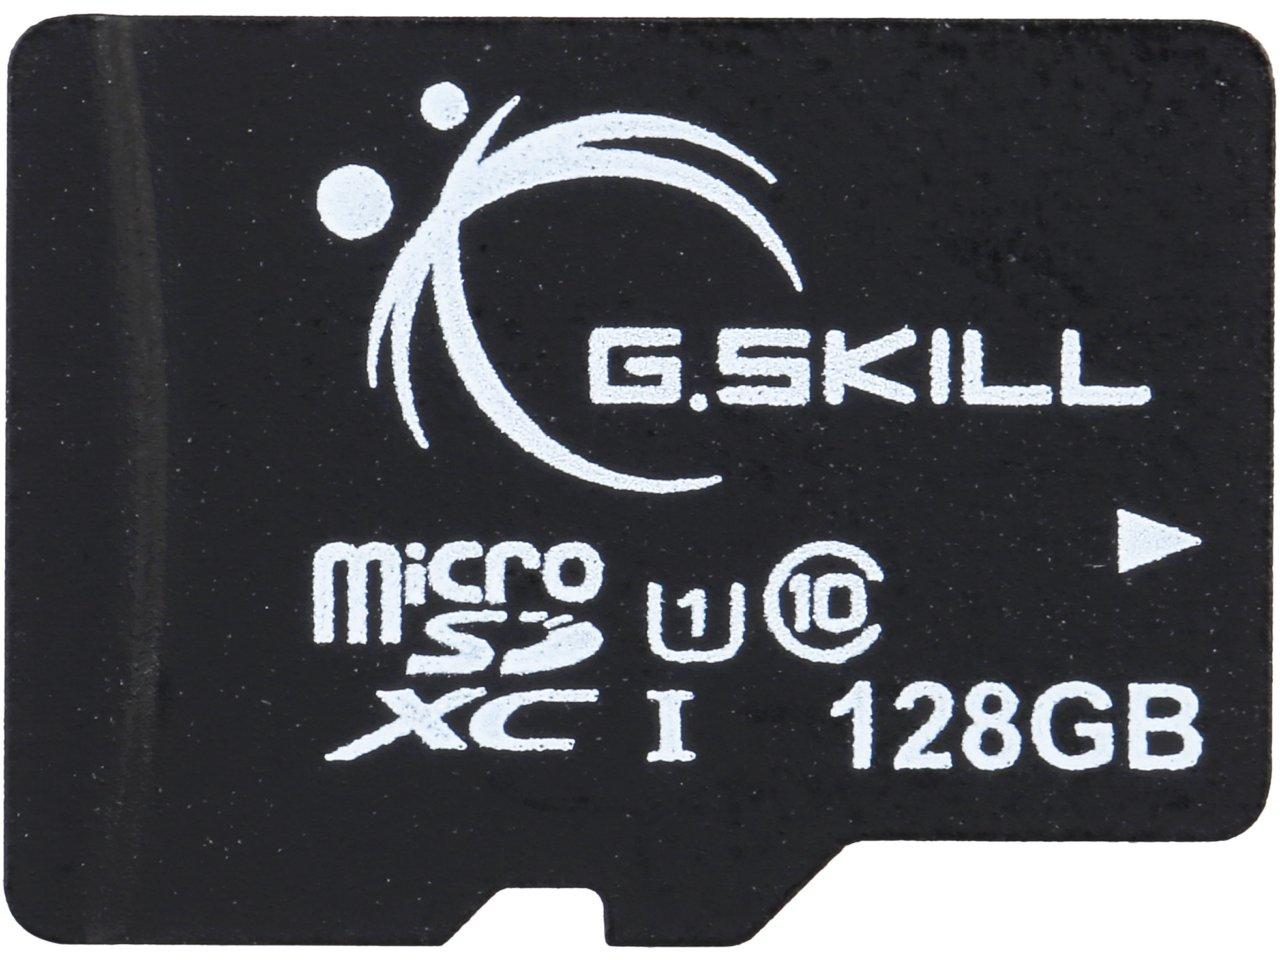 128 GB G.Skill Class 10 UHS-1 microSDXC Flash Card for $29.99 AC, 128 GB SanDisk Ultra Flair CZ73 USB 3.0 Flash Drive for $23.99 AC + S&H & More @ Newegg.com